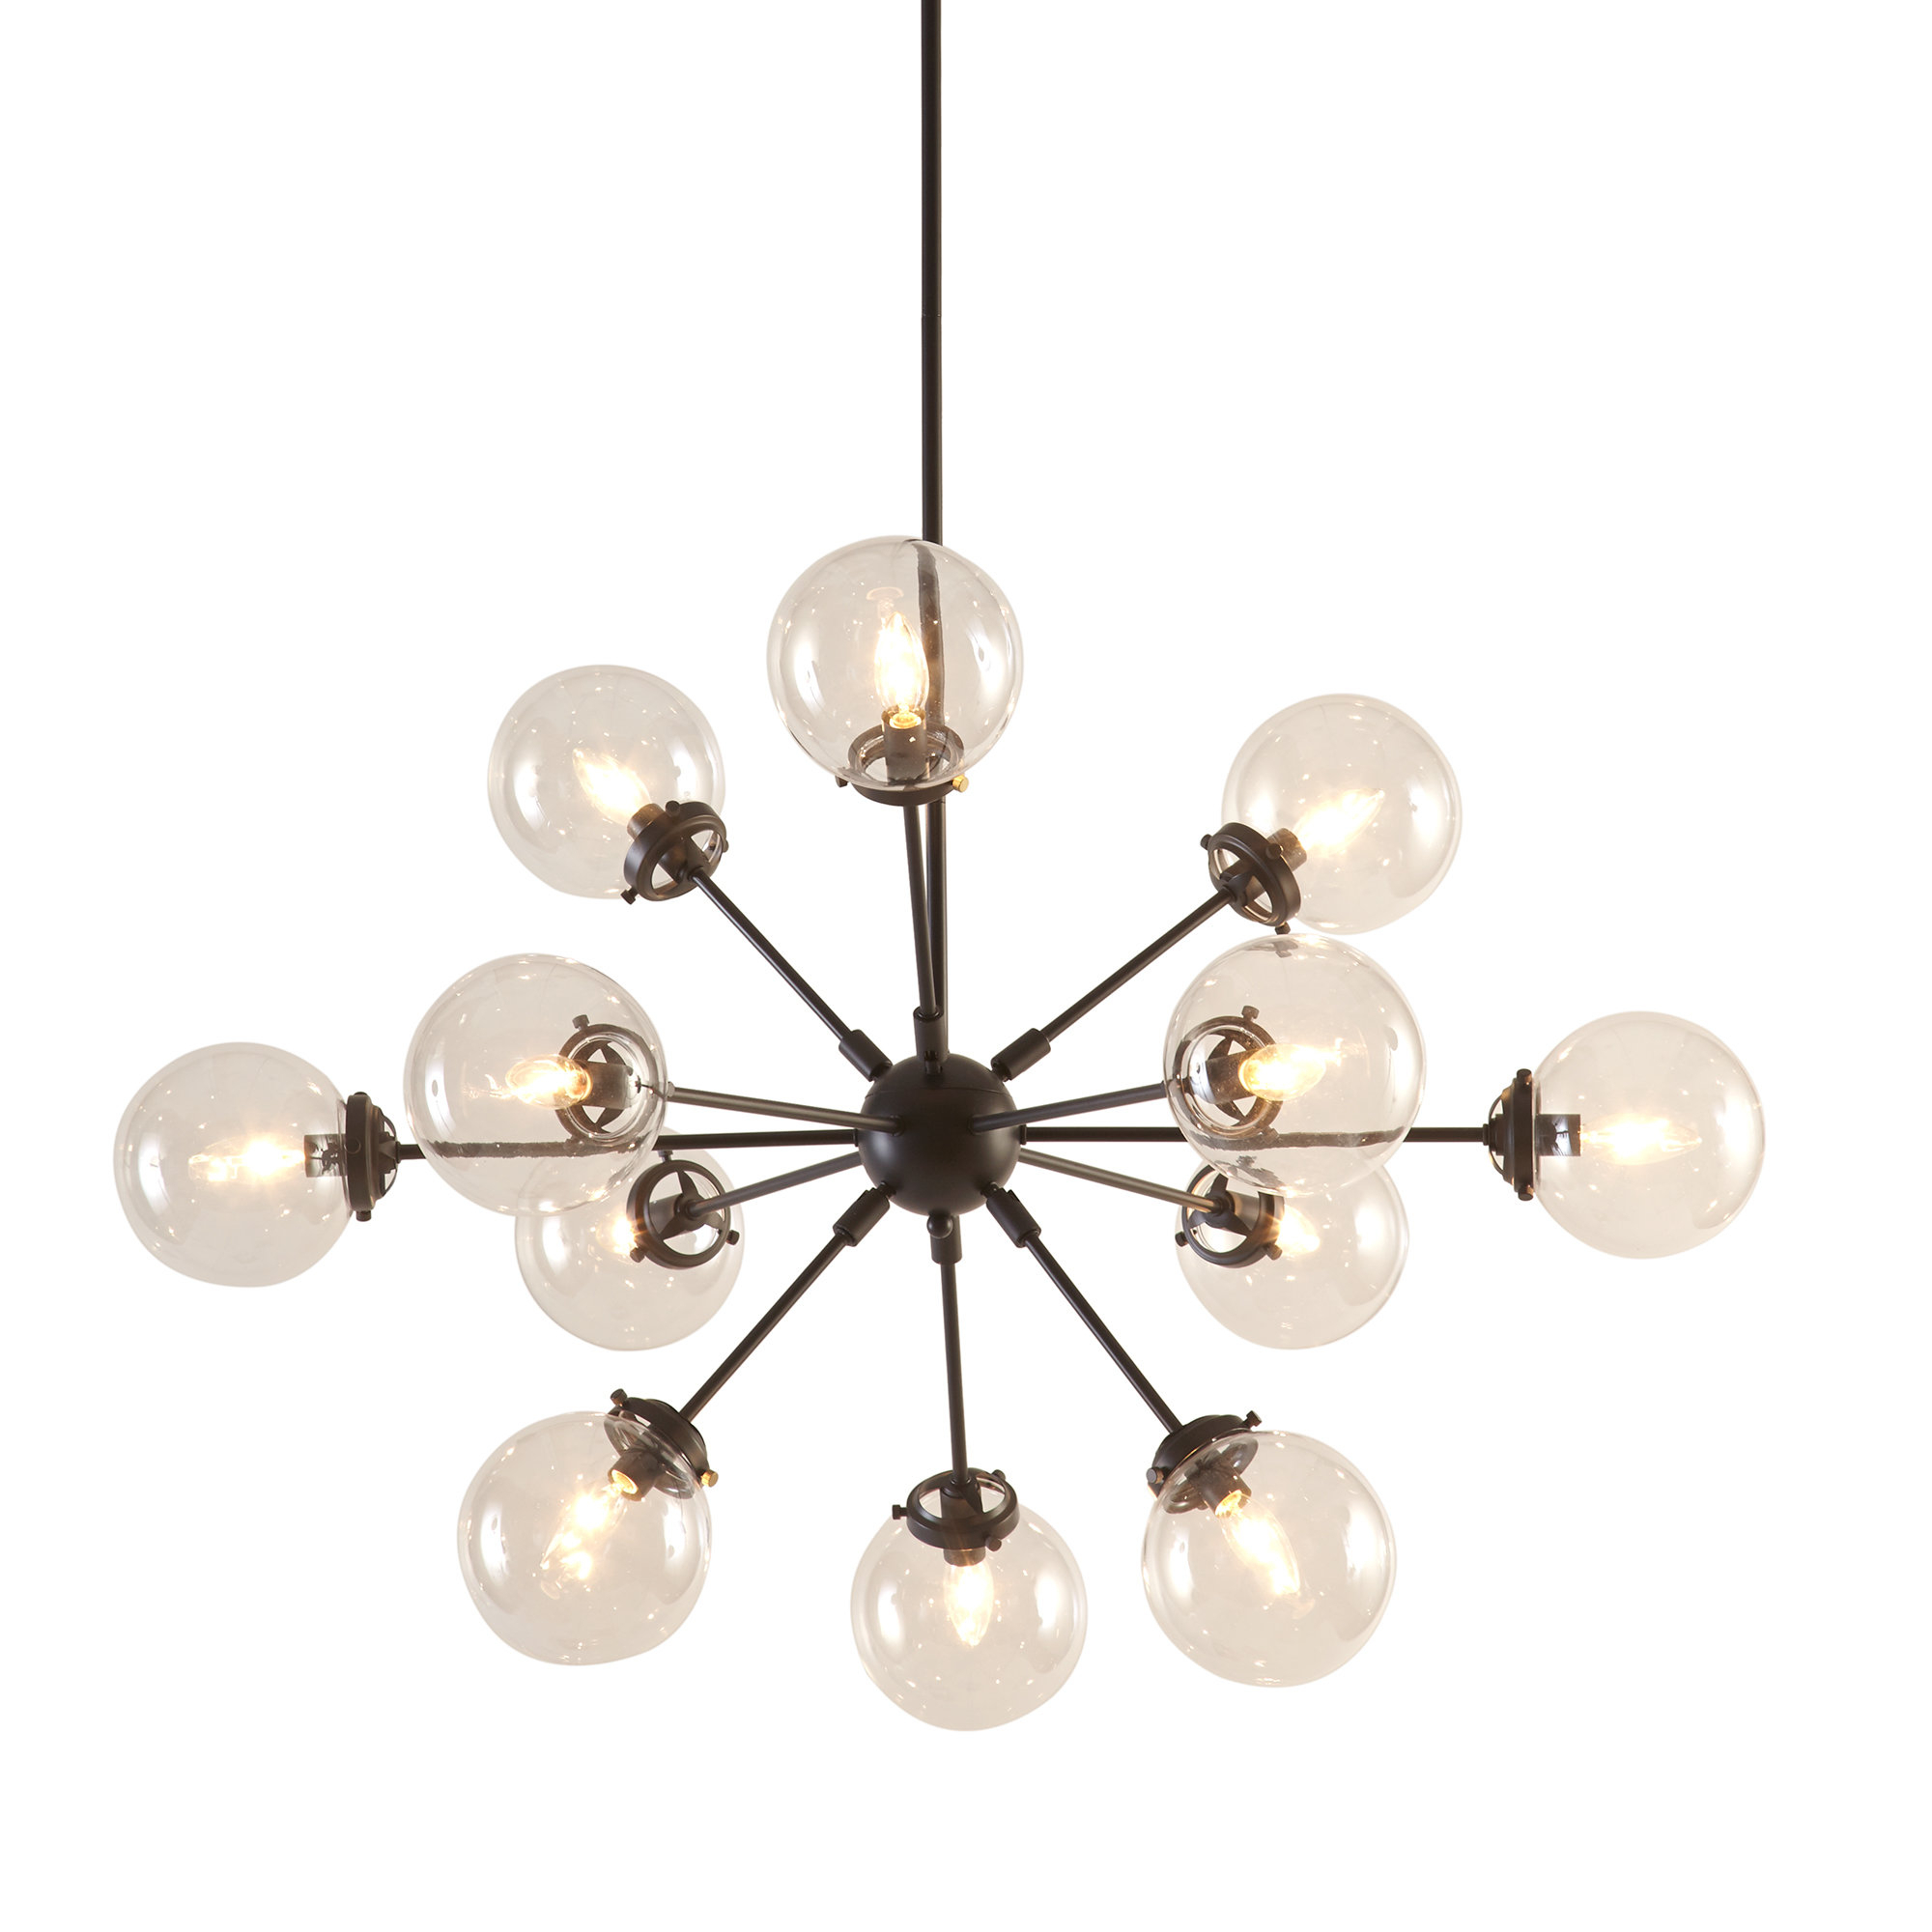 Asher 12 Light Sputnik Chandeliers Regarding Famous Modern Rustic Interiors Asher 12 Light Sputnik Chandelier (View 7 of 25)